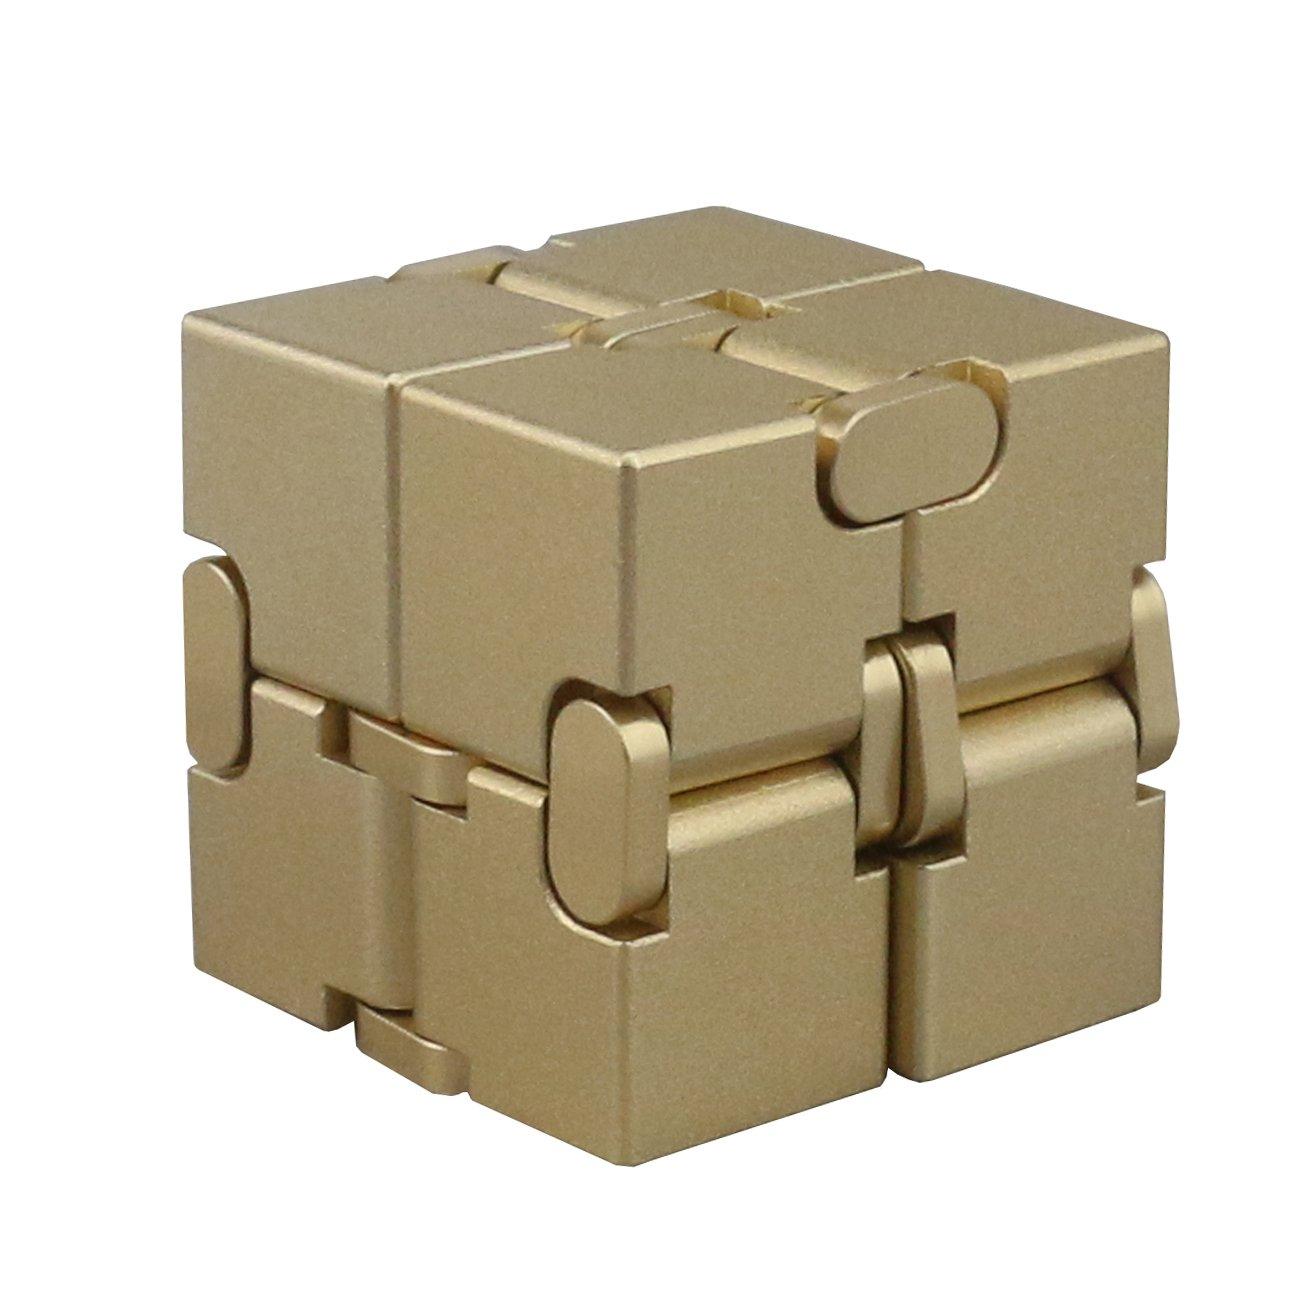 Ogrmar Aluminum Alloy Infinity Cube Fidget Toy Hand Killing Time Fidget Spinner Prime Infinite Cube For Adult and Children